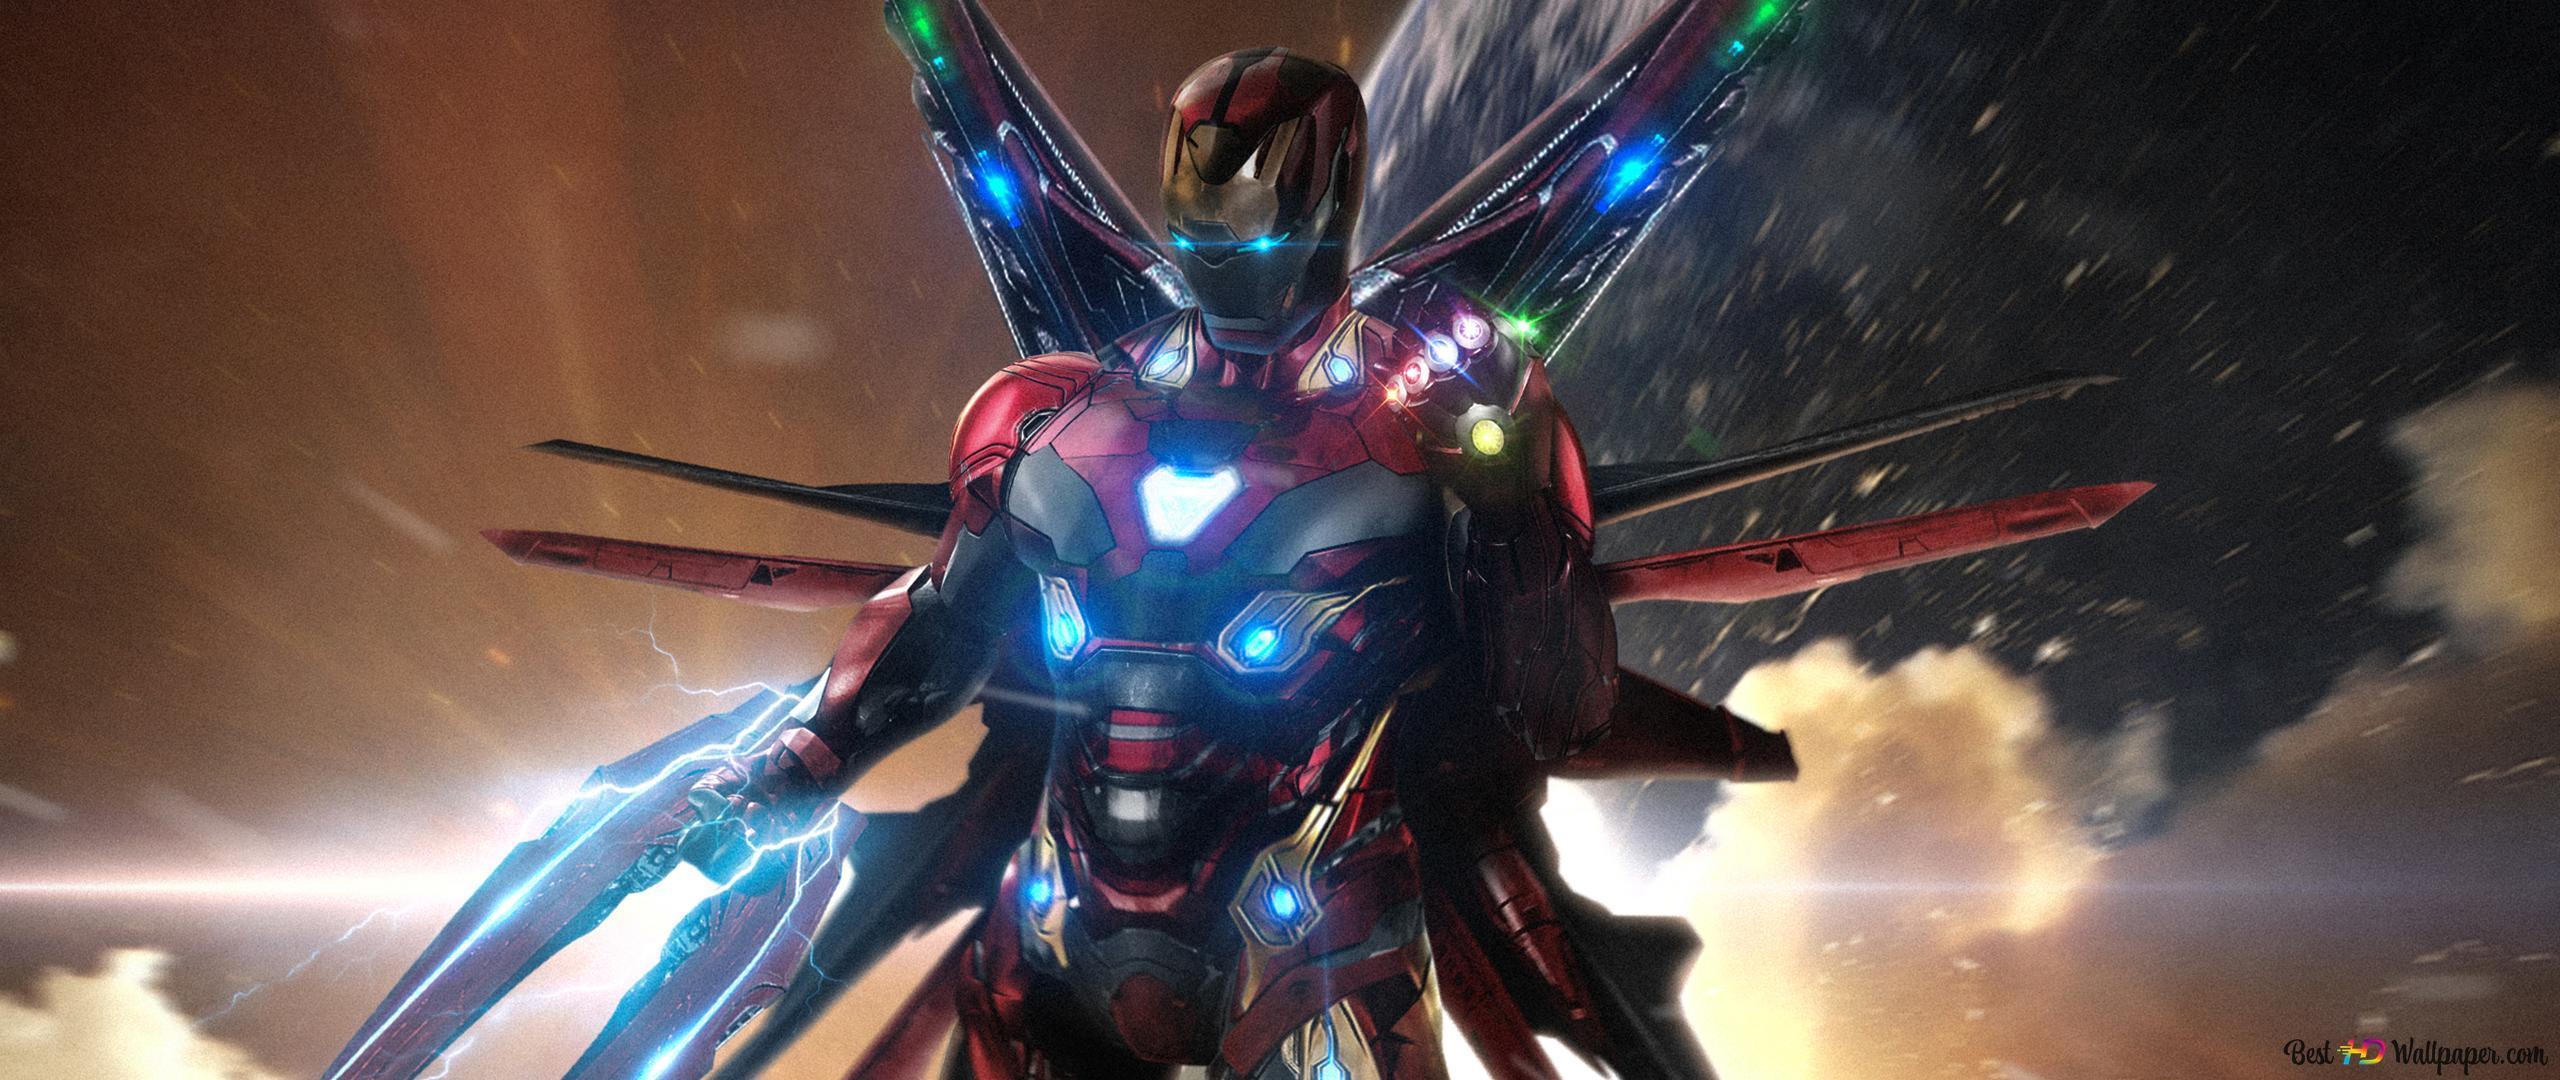 Avengers Endgame Superhero Ironman With Infinity